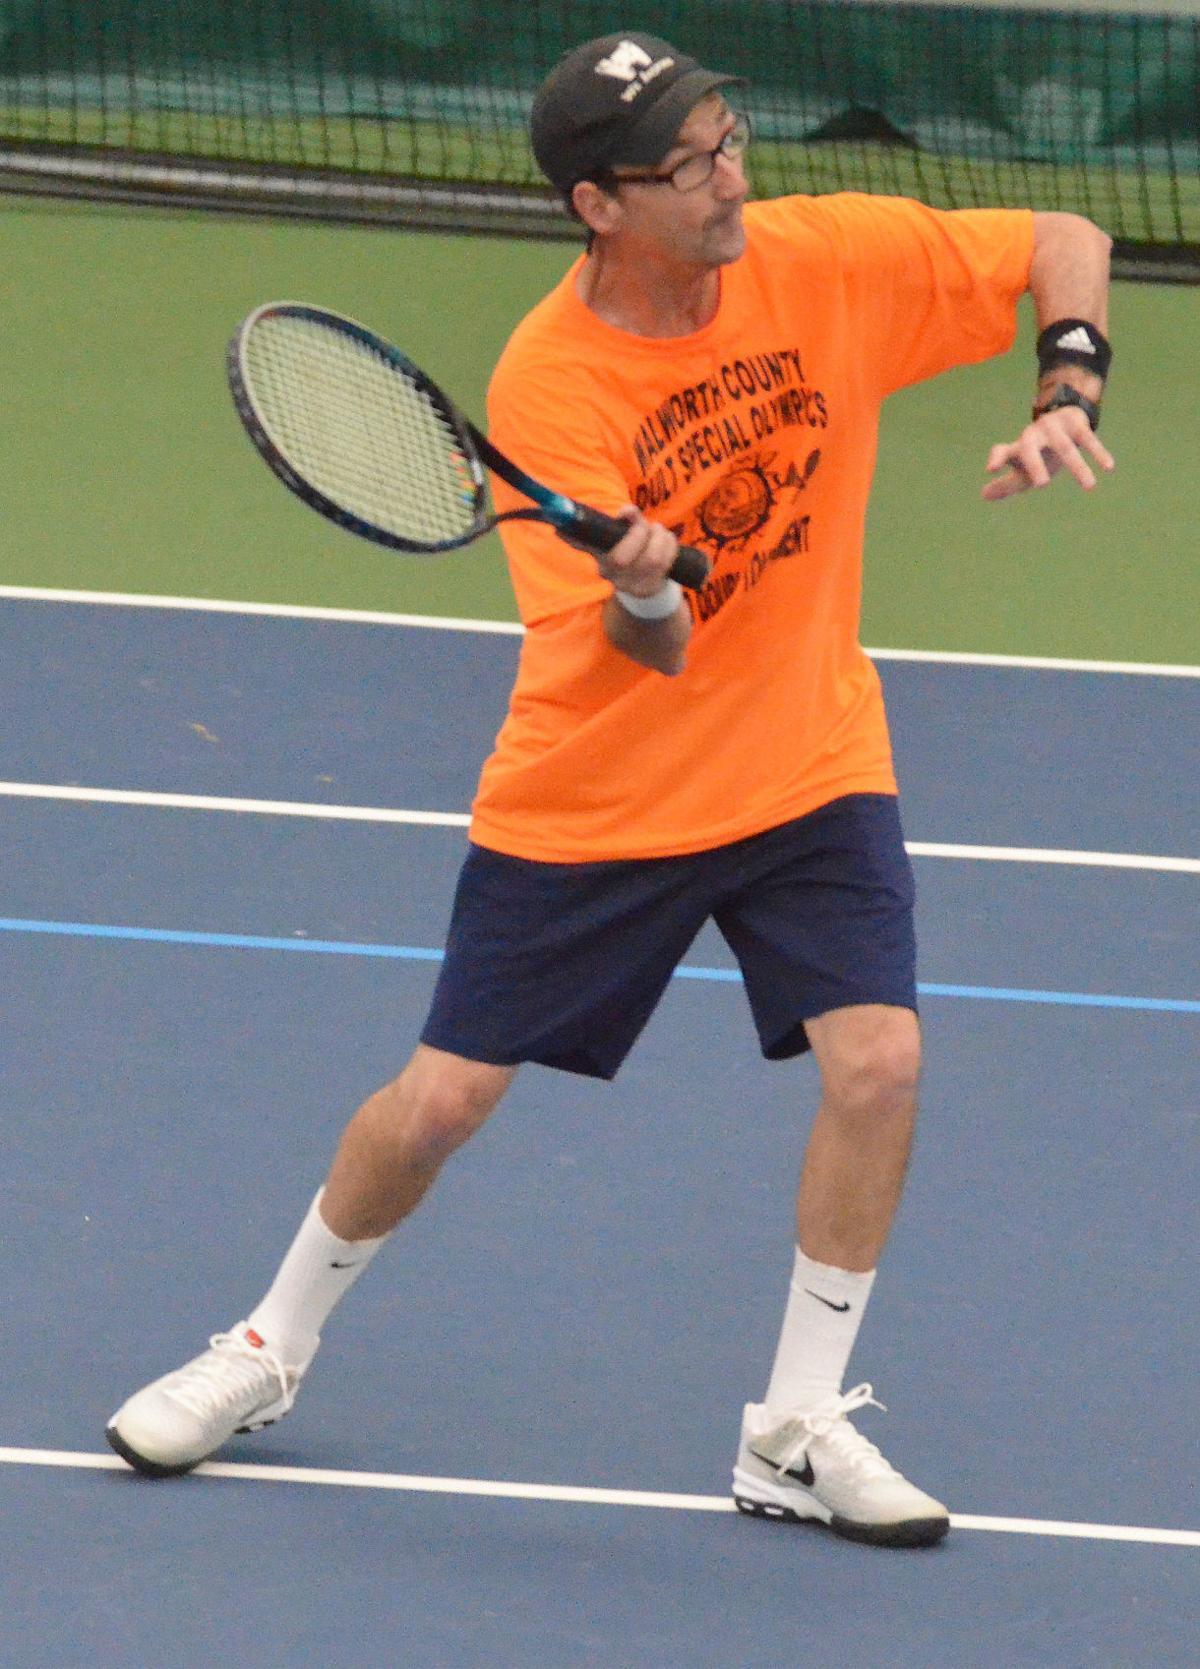 Michael Poll tennis